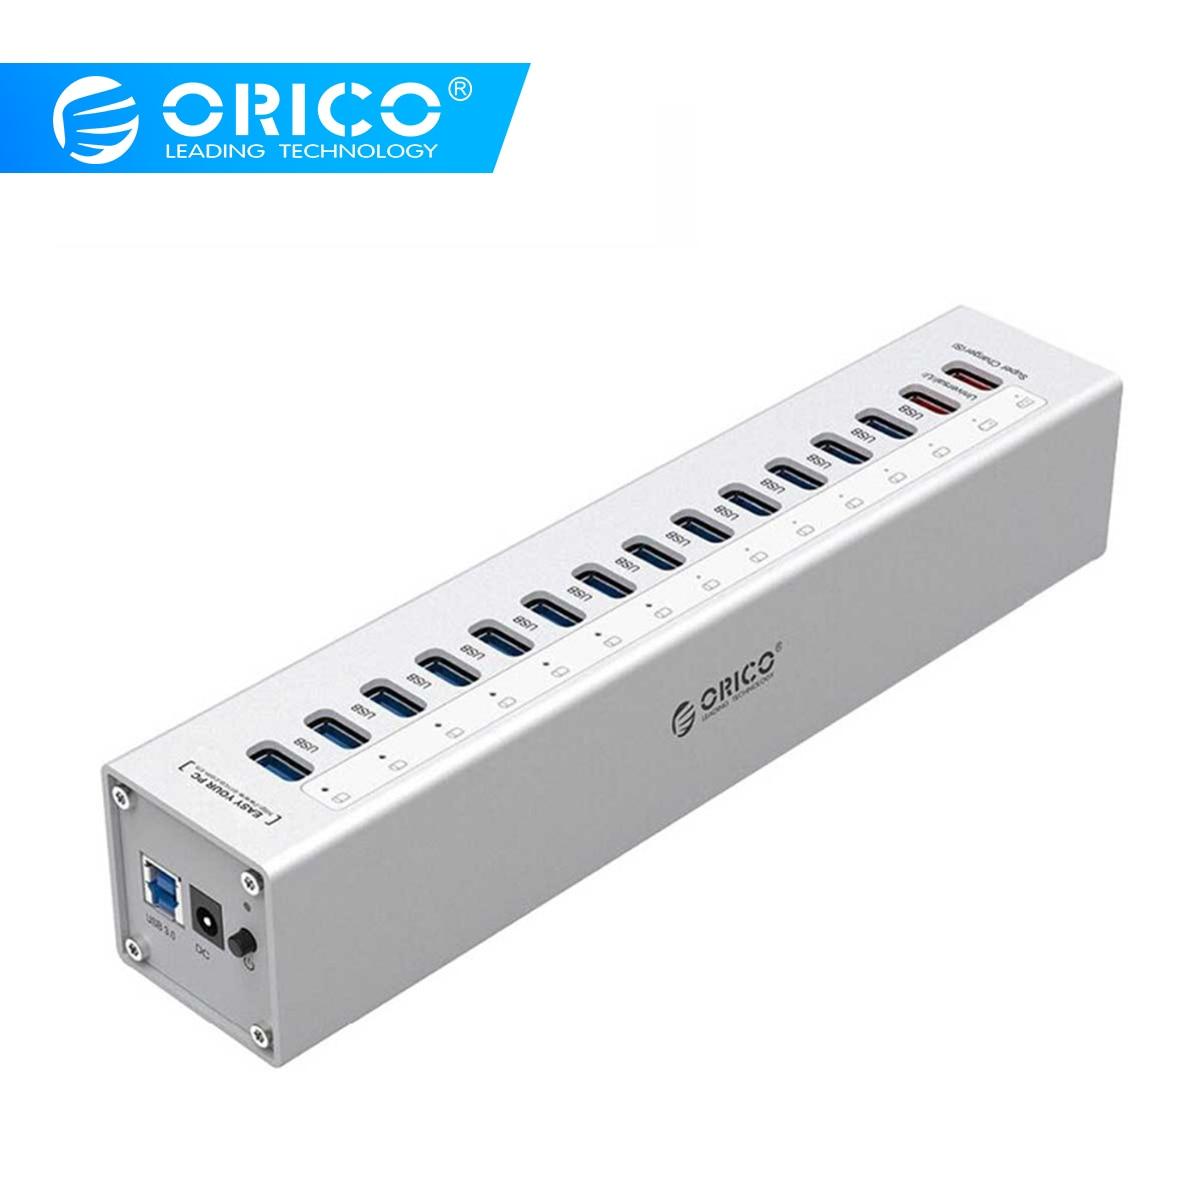 ORICO A3H13P2 SV Aluminum 13 Ports Multi USB3 0 HUB Splitter with 2 Charging Ports 5V2